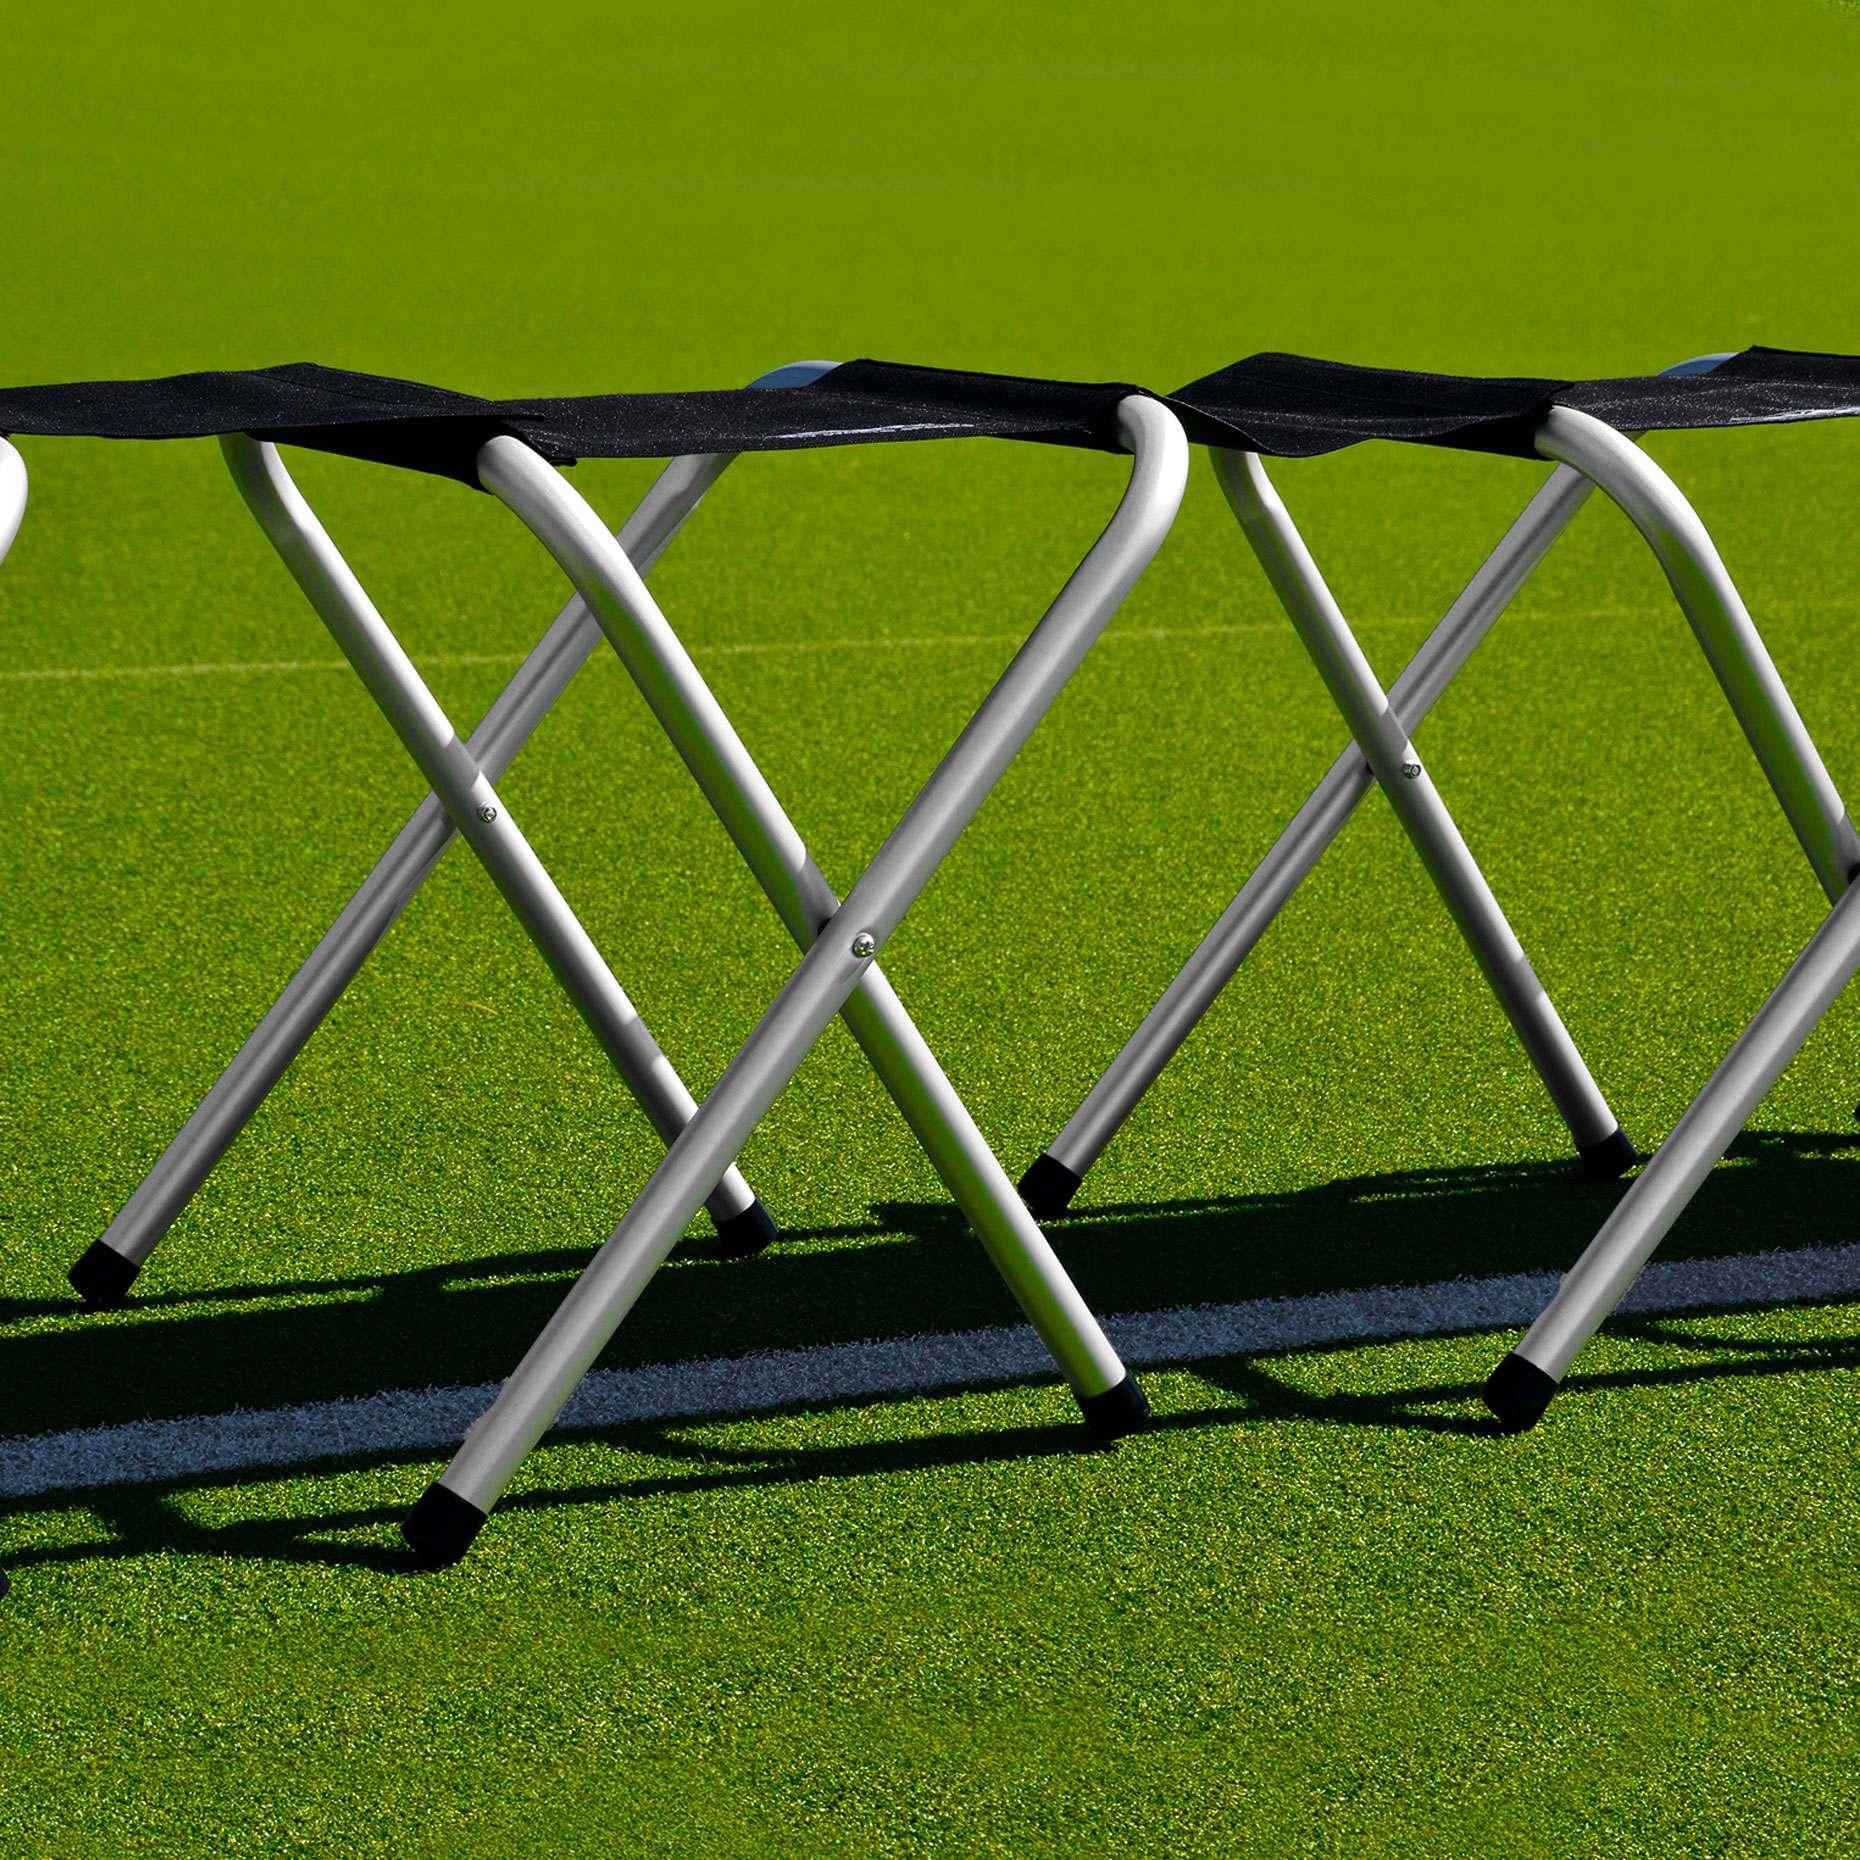 Portable Aluminum Soccer Team Bench Net World Sports